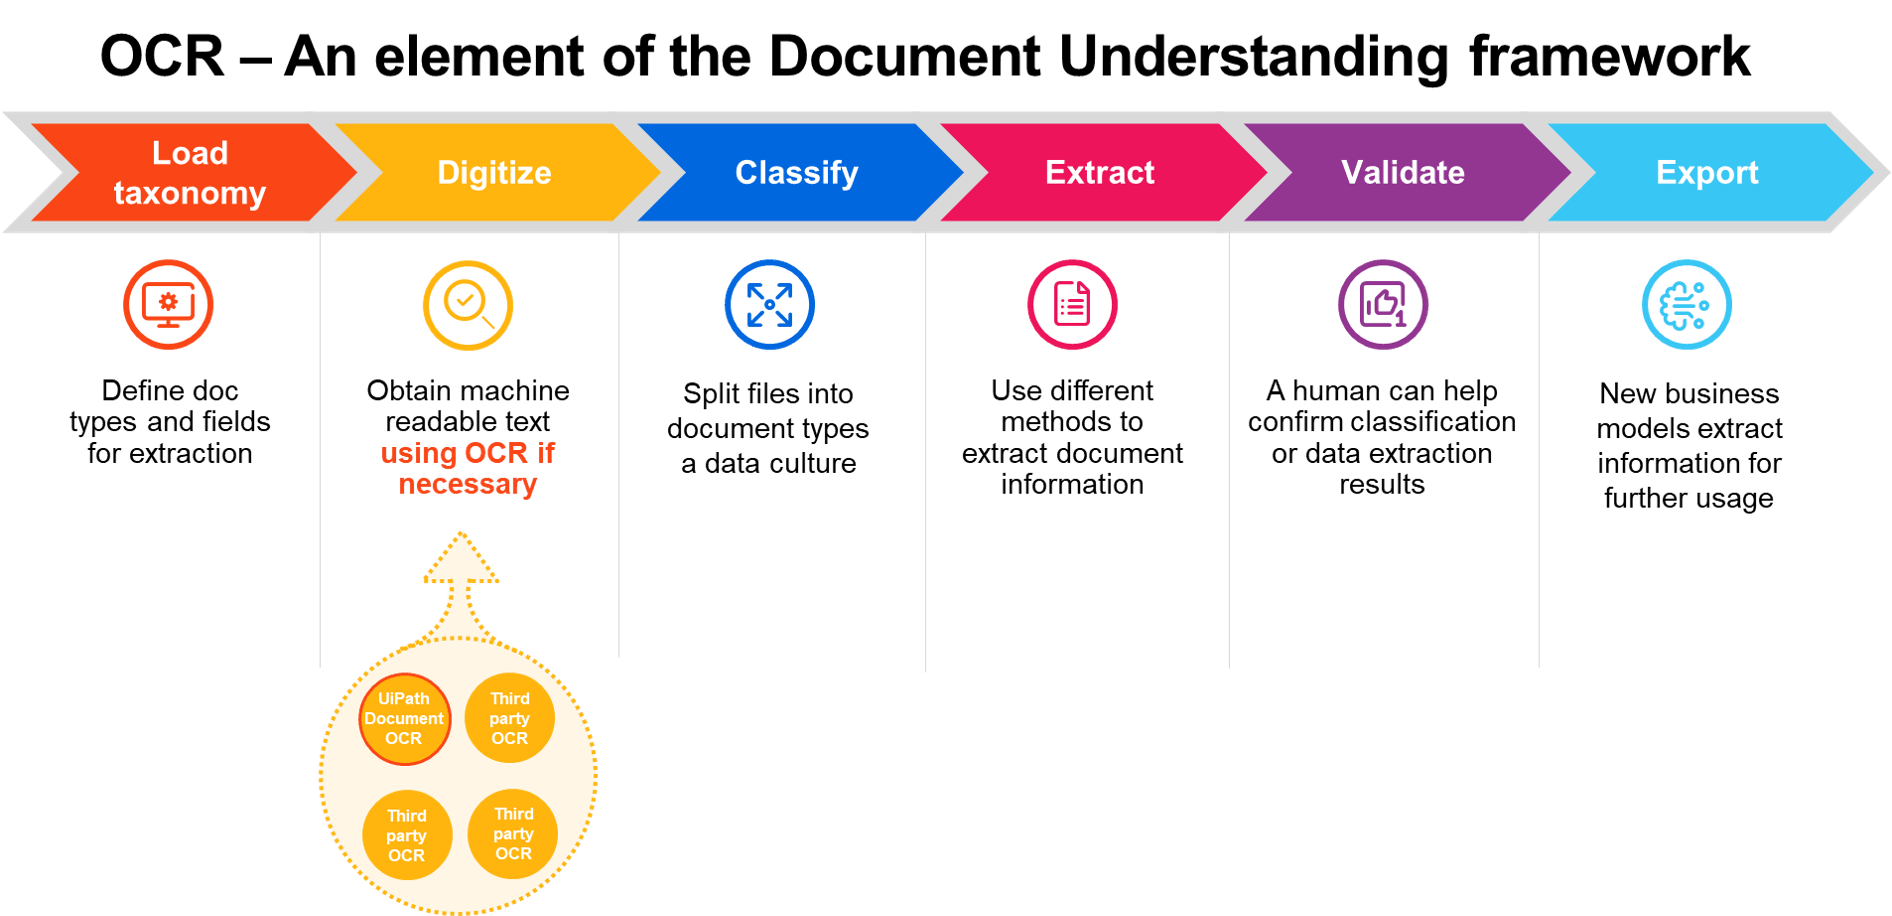 ocr element of document understanding framework